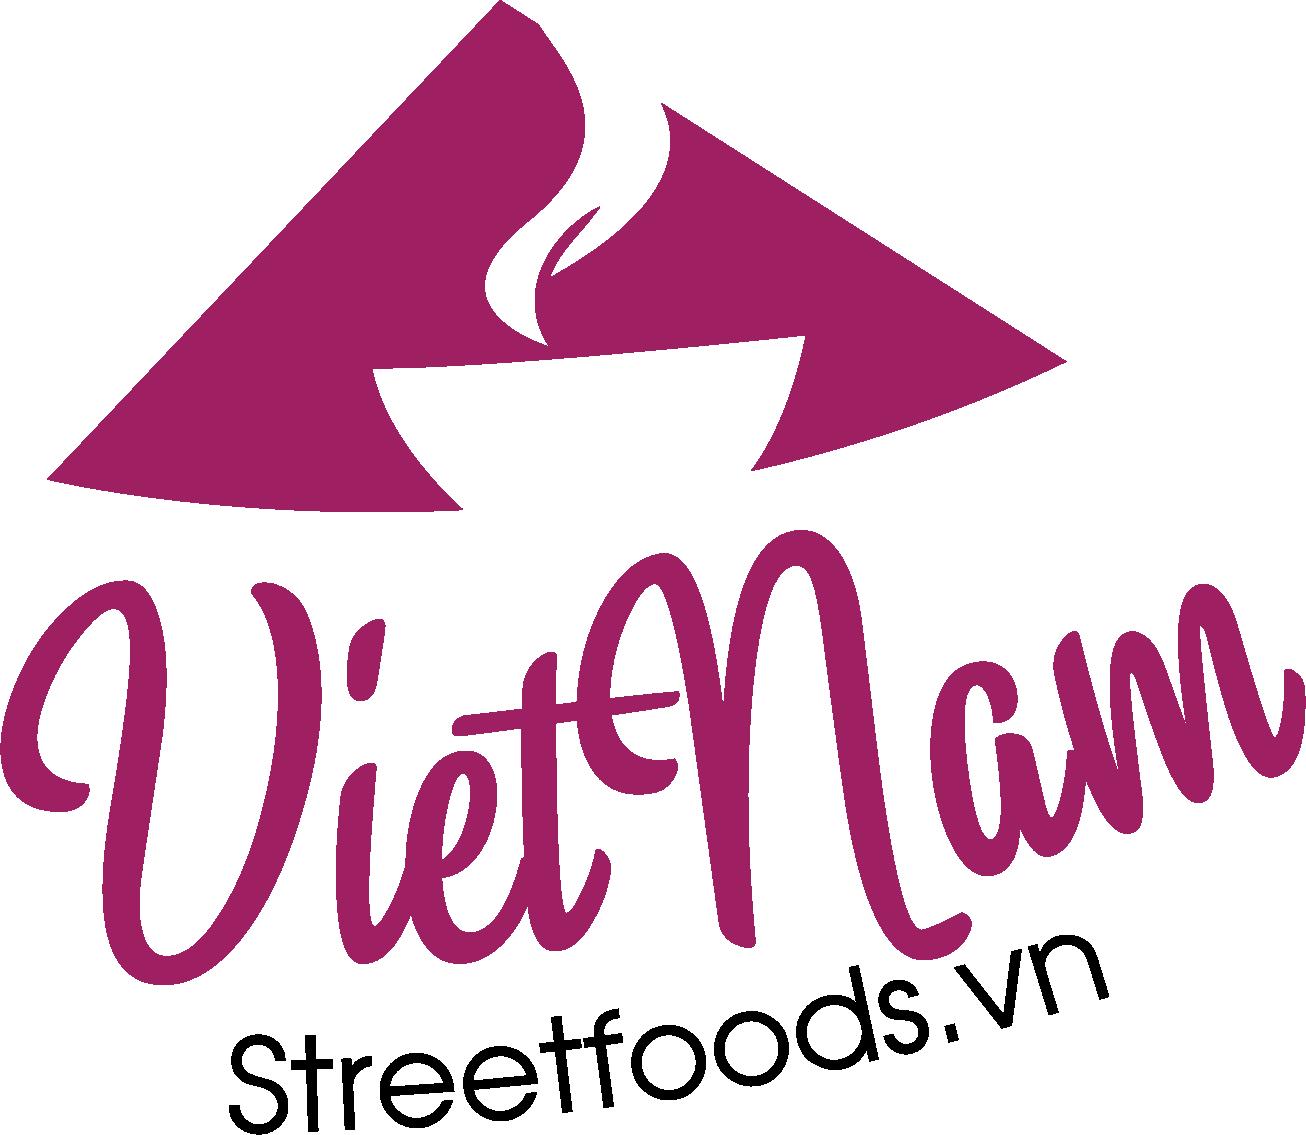 vietnamstreetfoodsvn